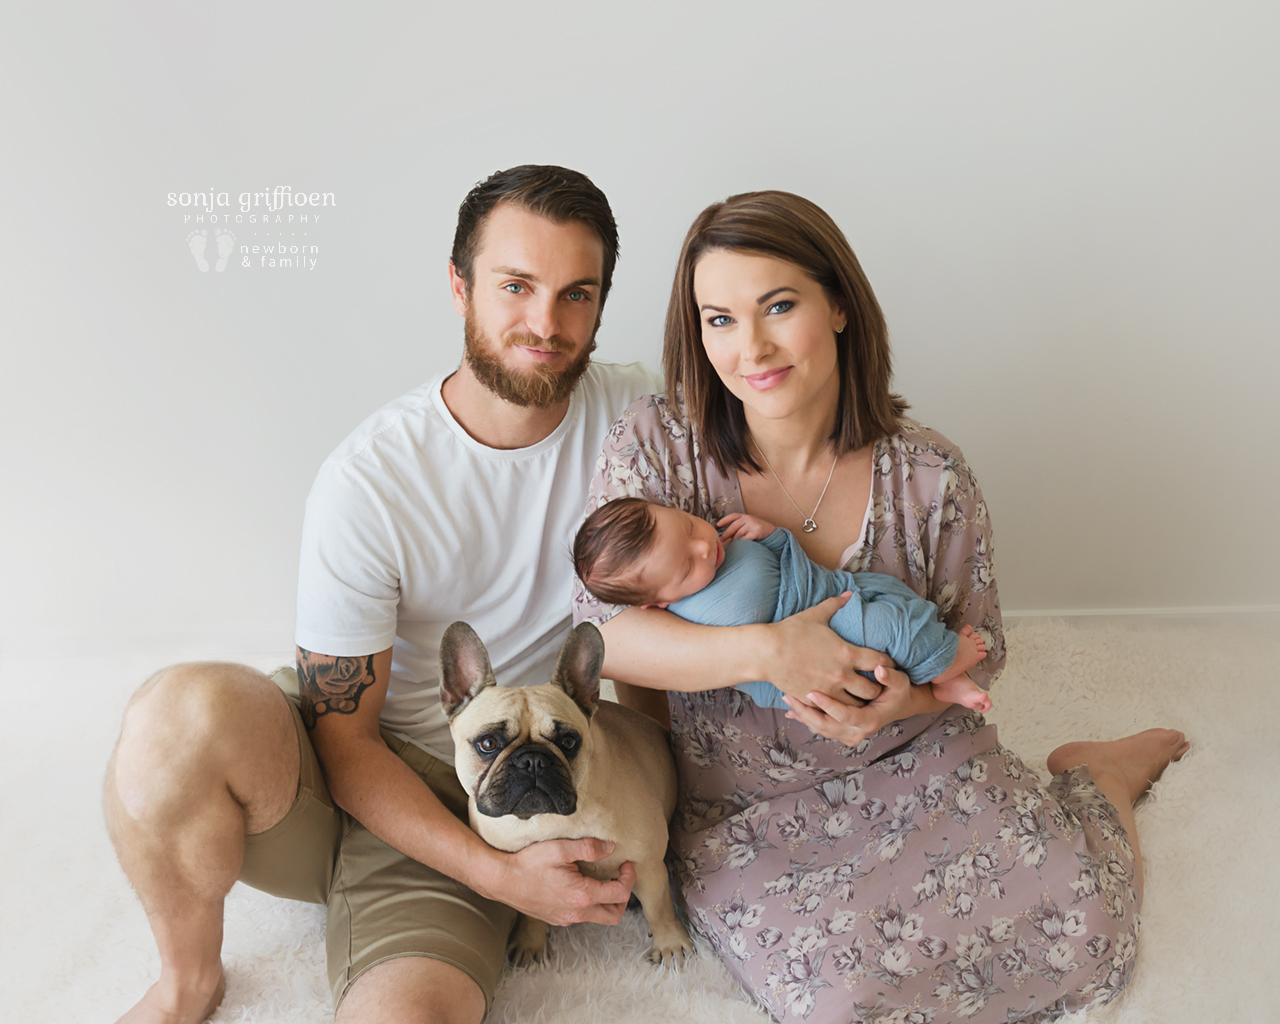 Lennox-Newborn-Brisbane-Newborn-Photographer-Sonja-Griffioen-01.jpg